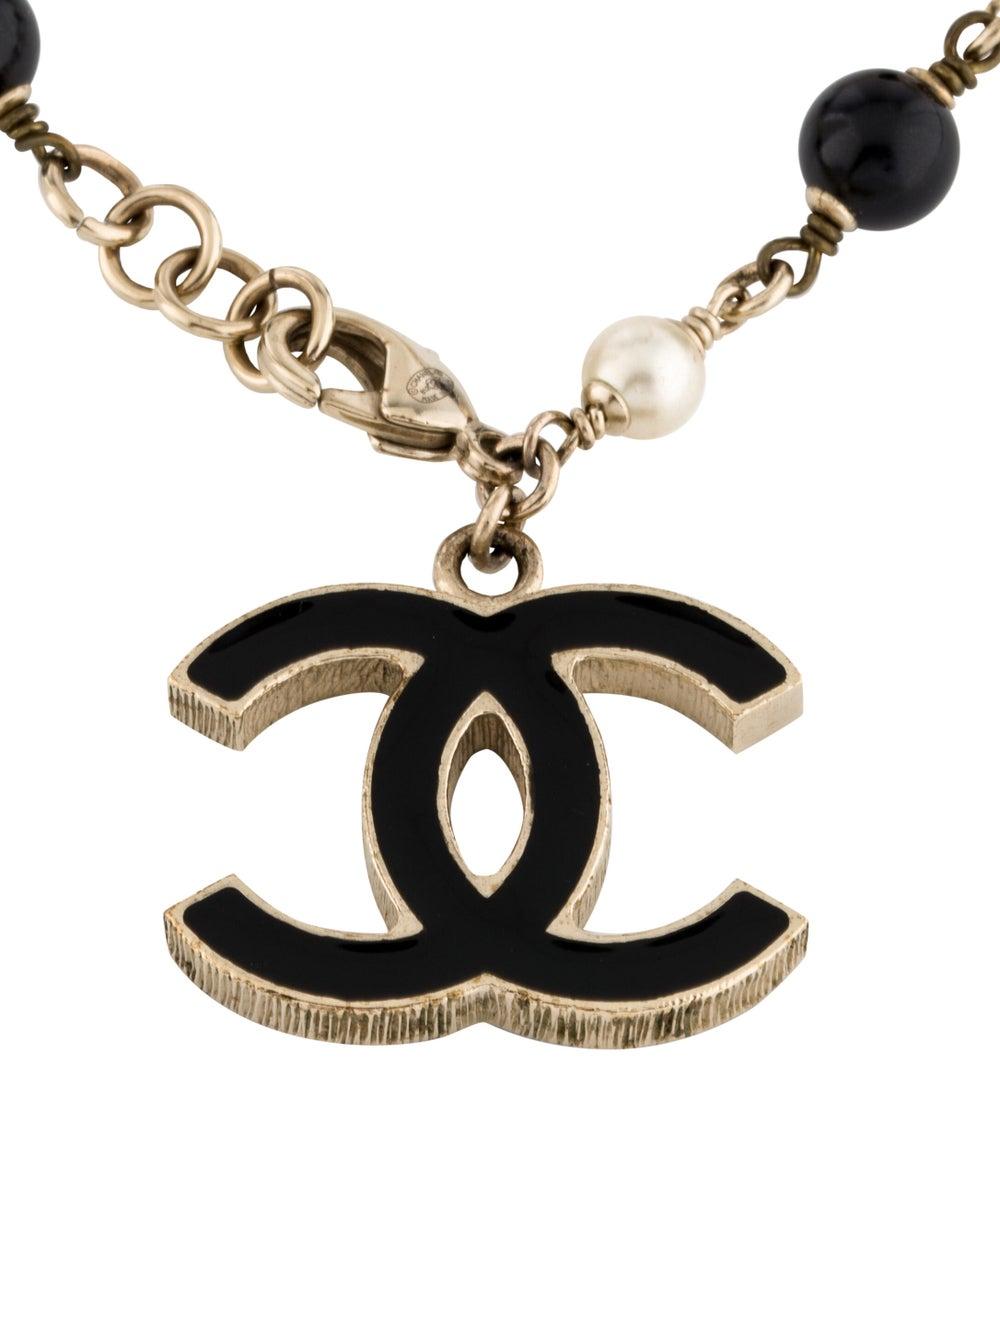 Chanel Faux Pearl & Resin CC Bracelet Gold - image 3